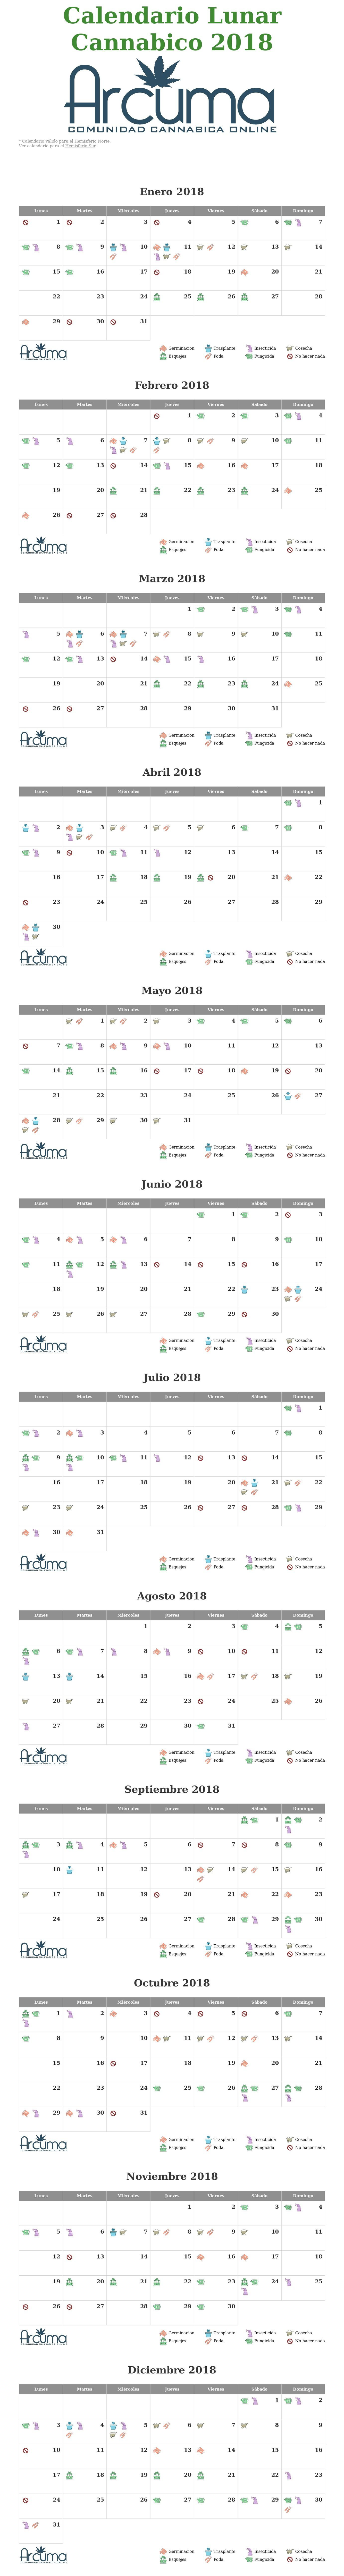 Calendario lunar 2018 hemisferio sur